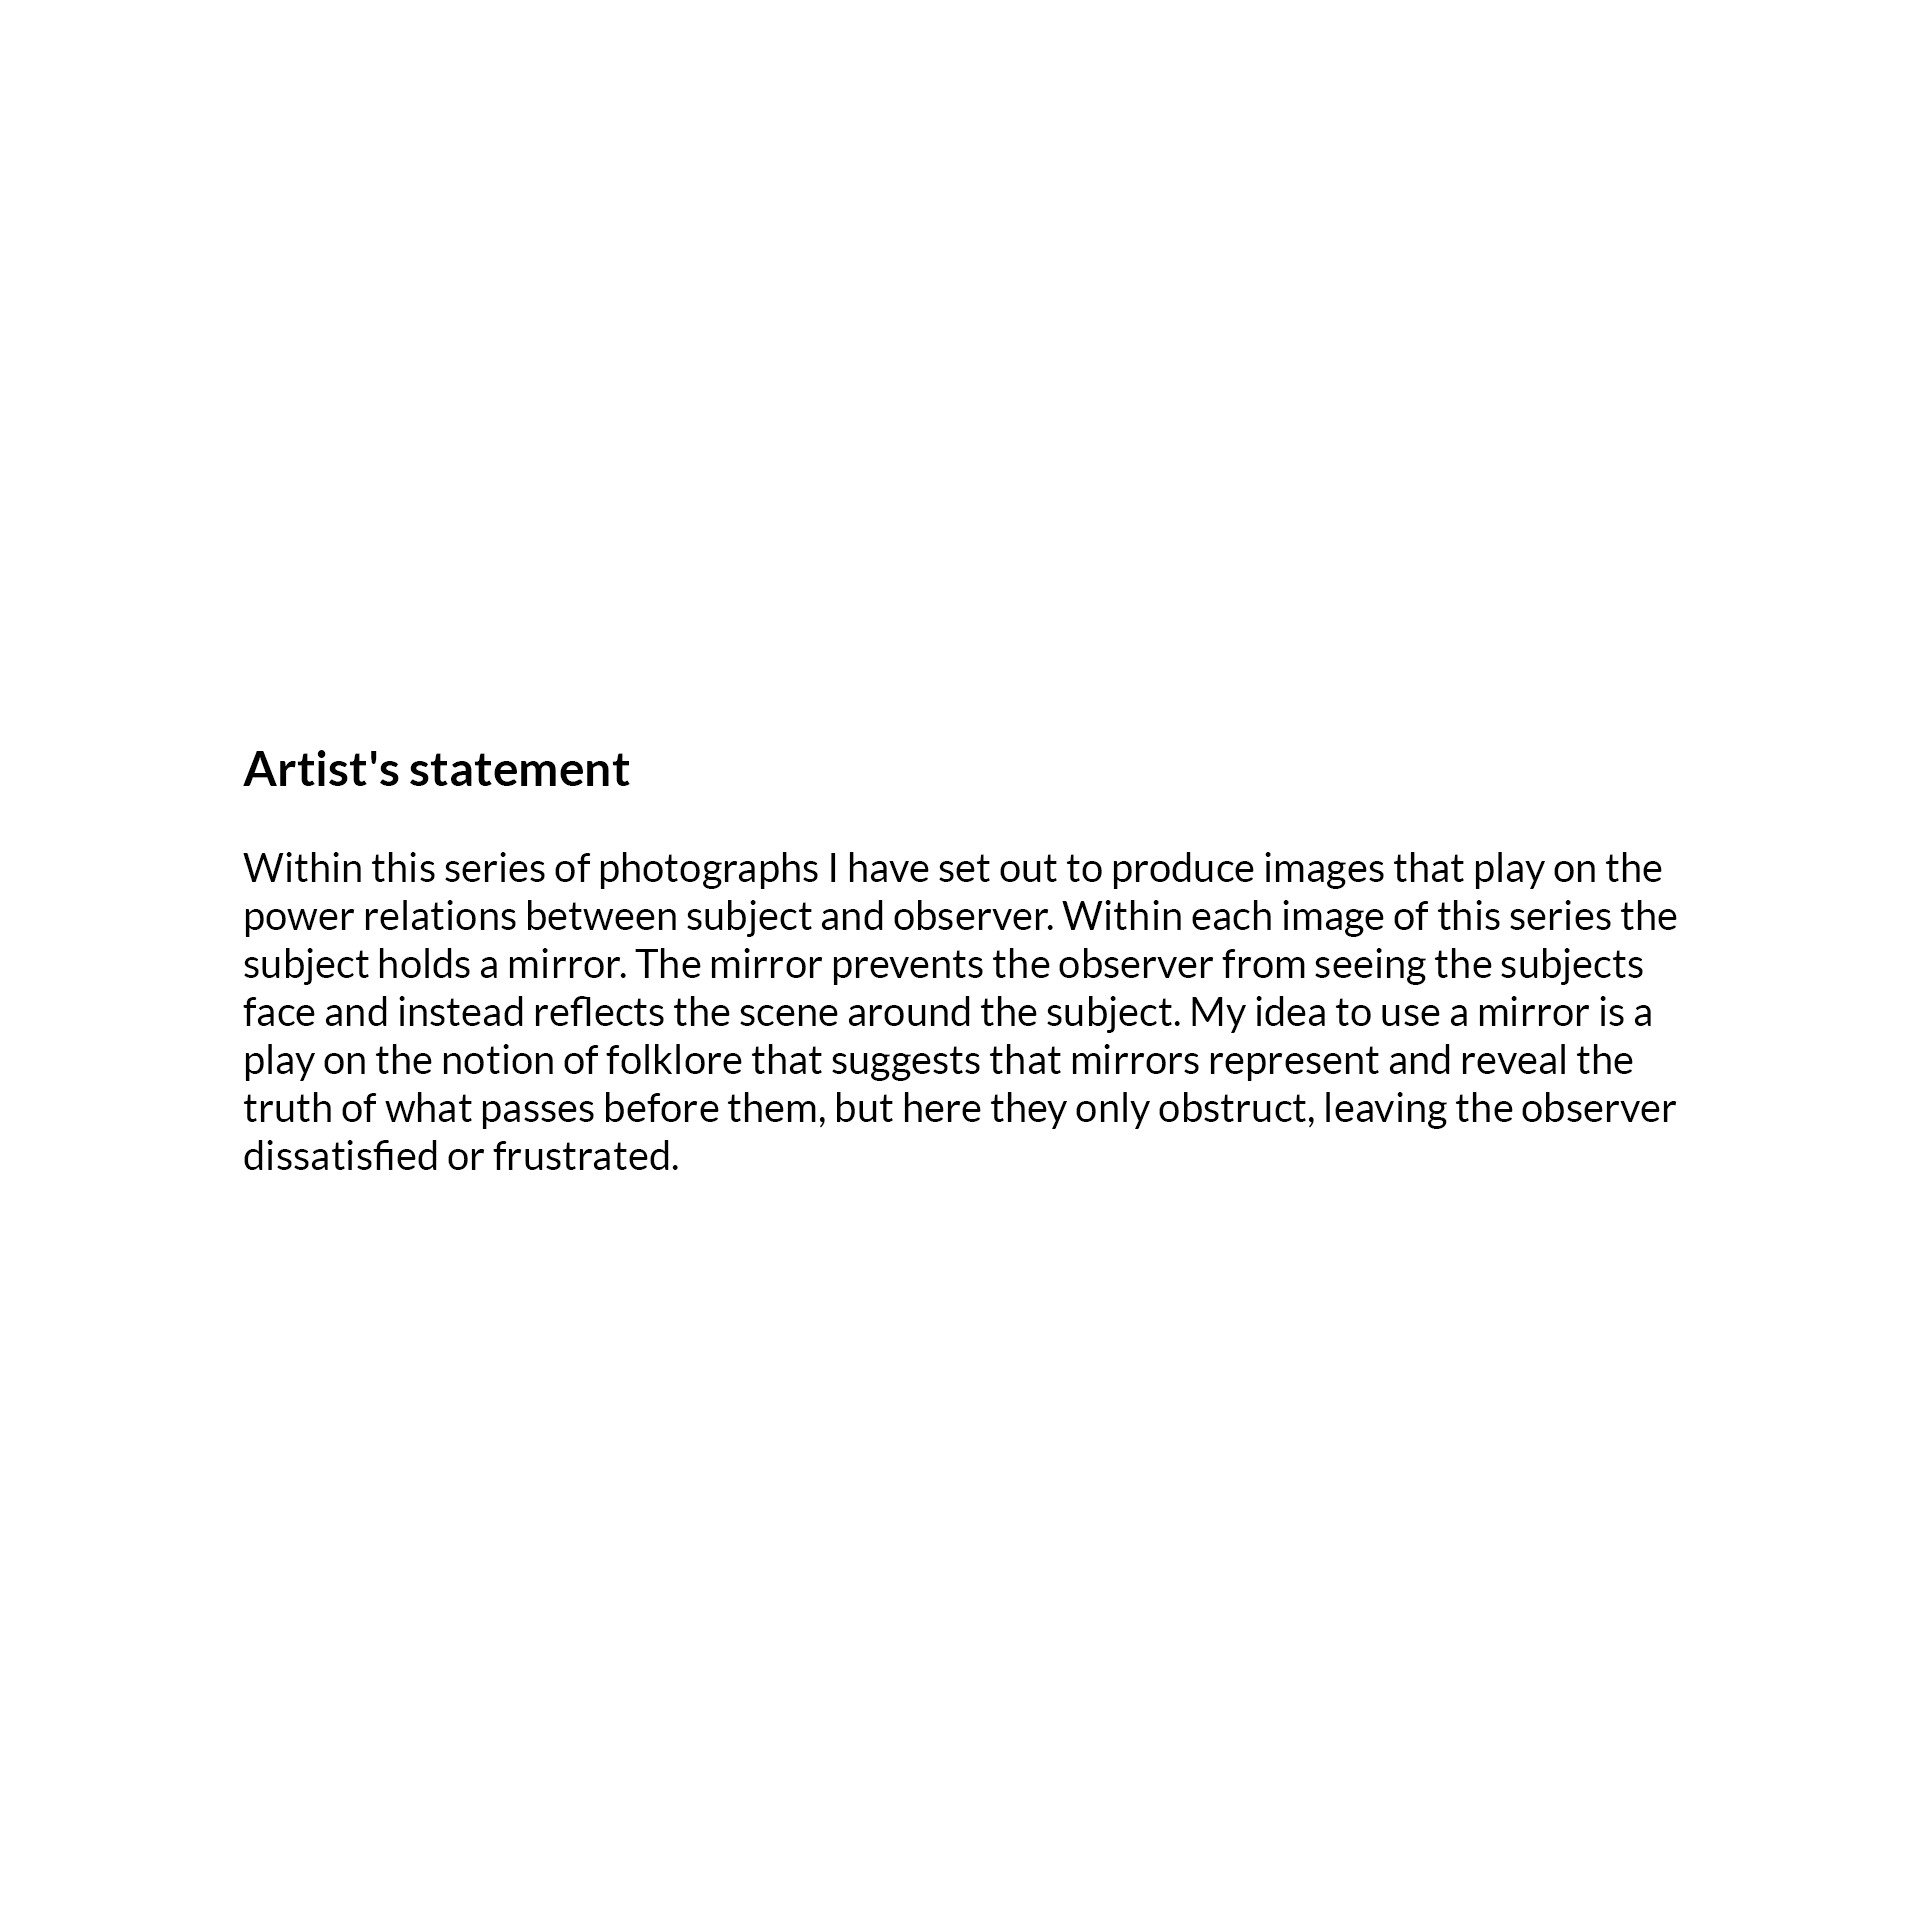 Artist's statement Primacy Subject